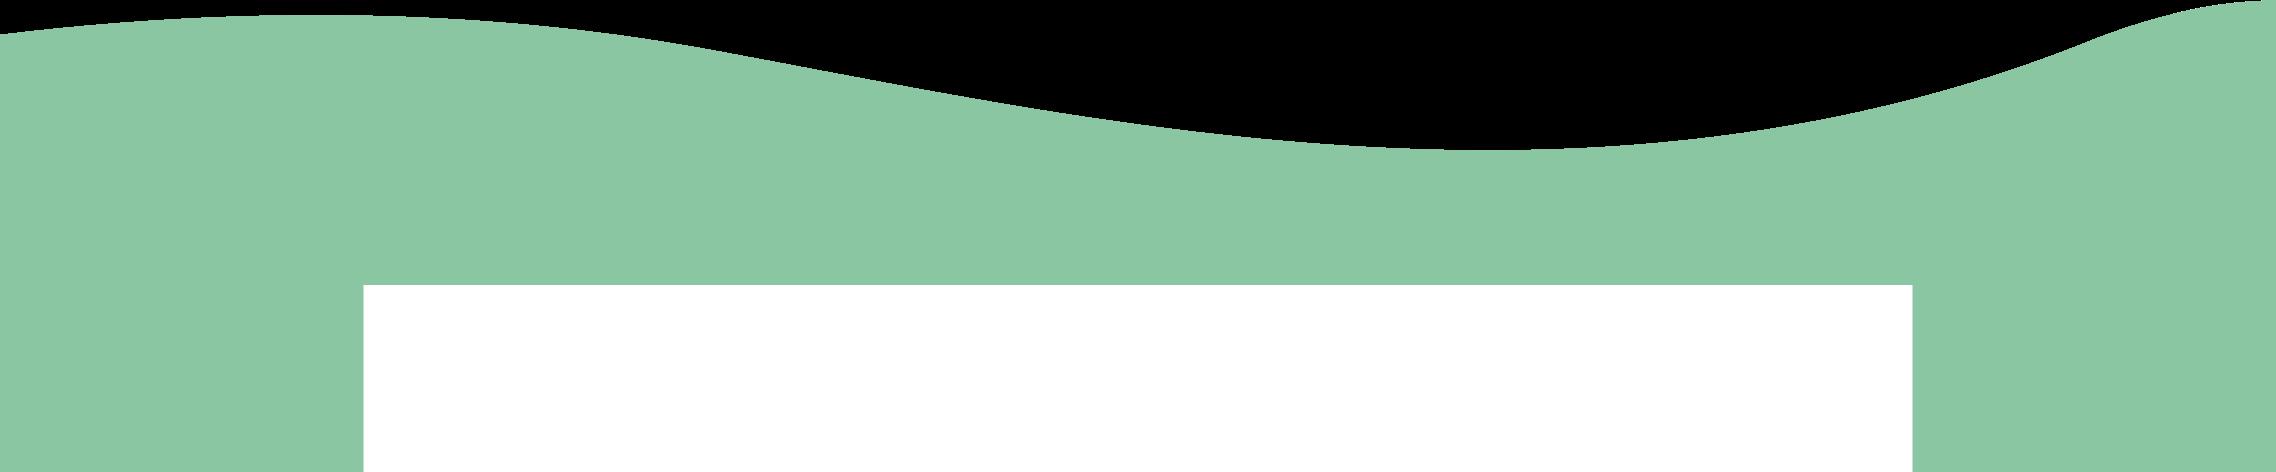 RTC shape